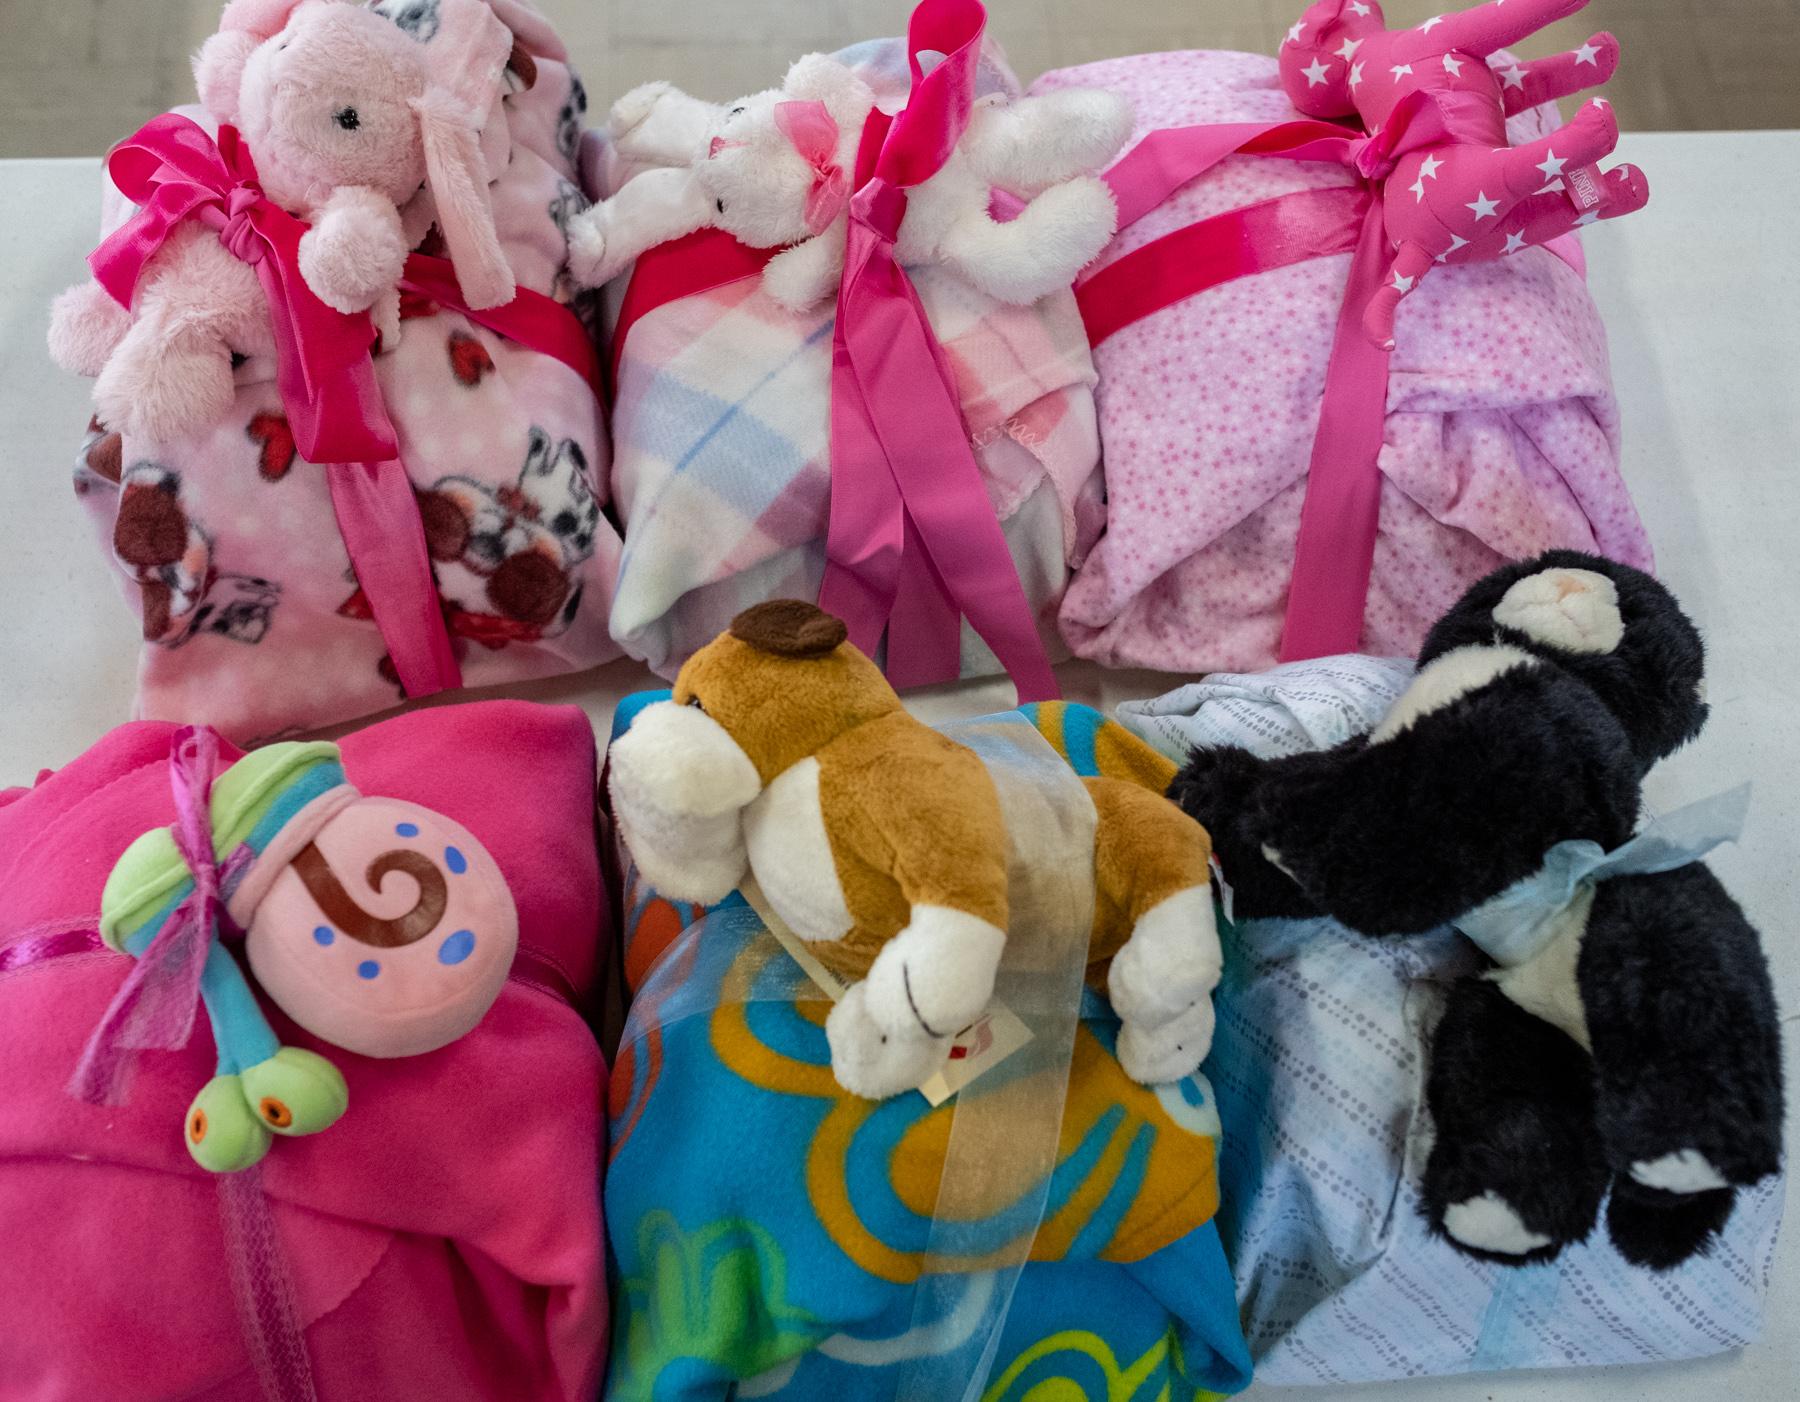 Copy of Newborn care bundles